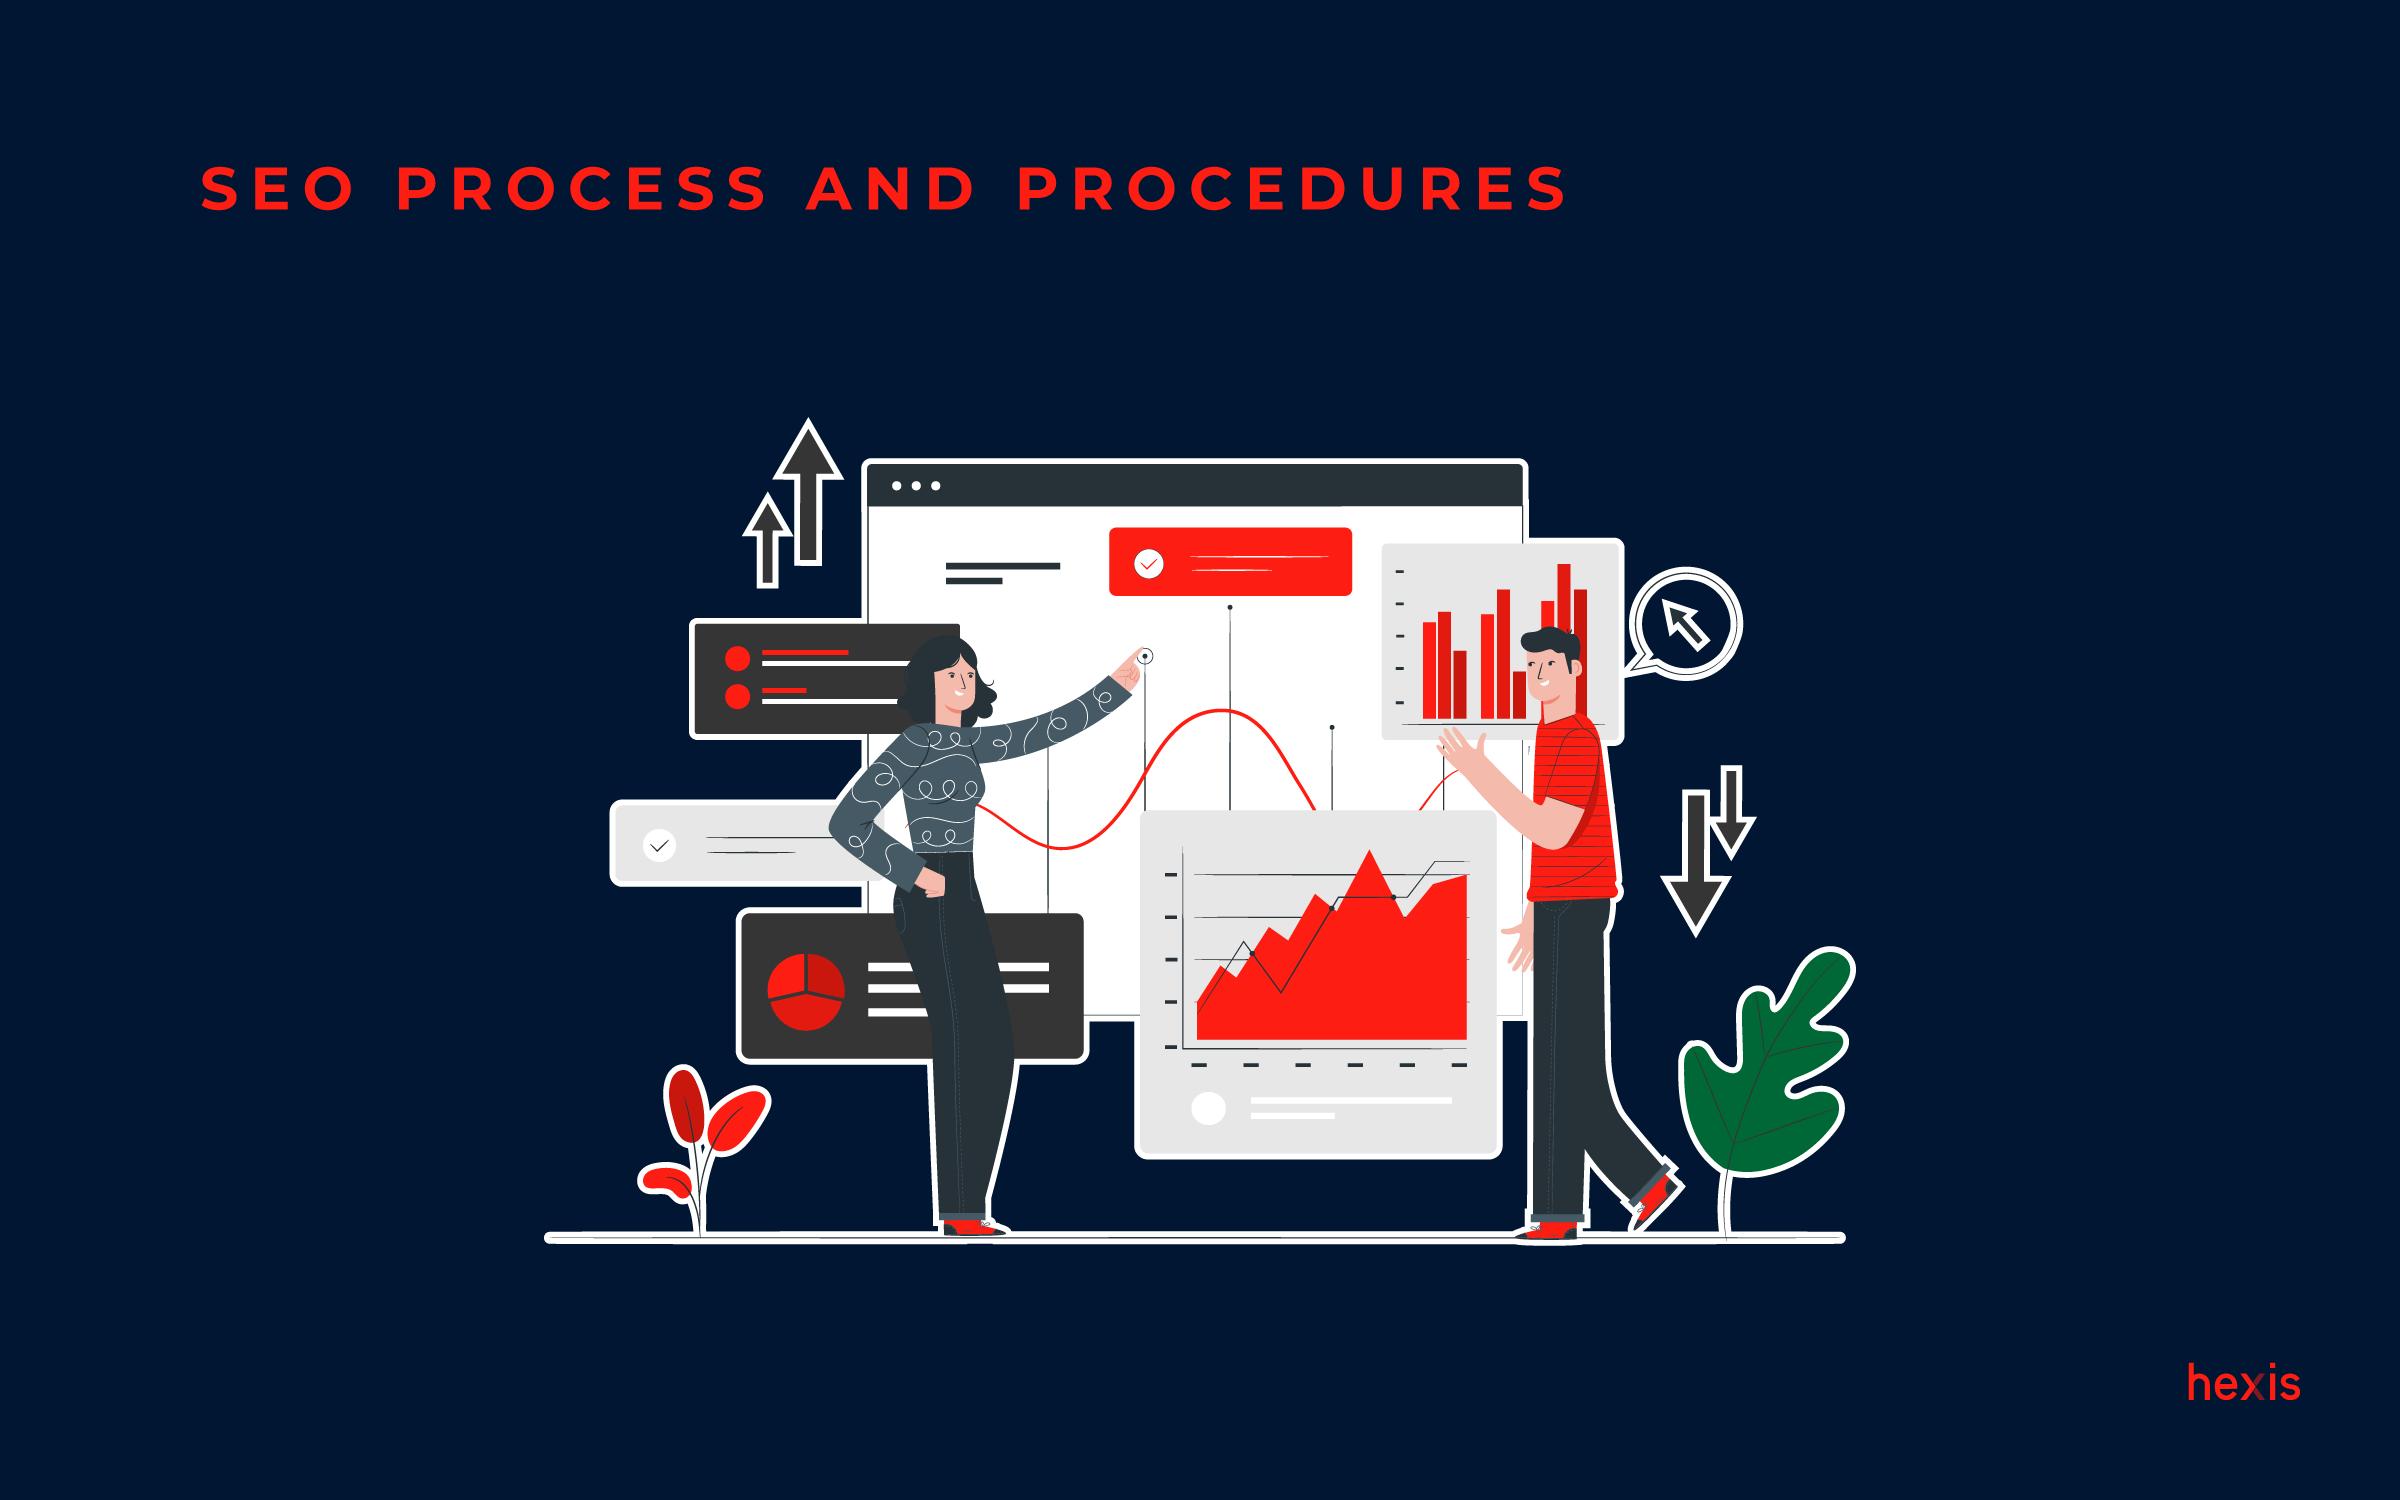 seo process and procedures